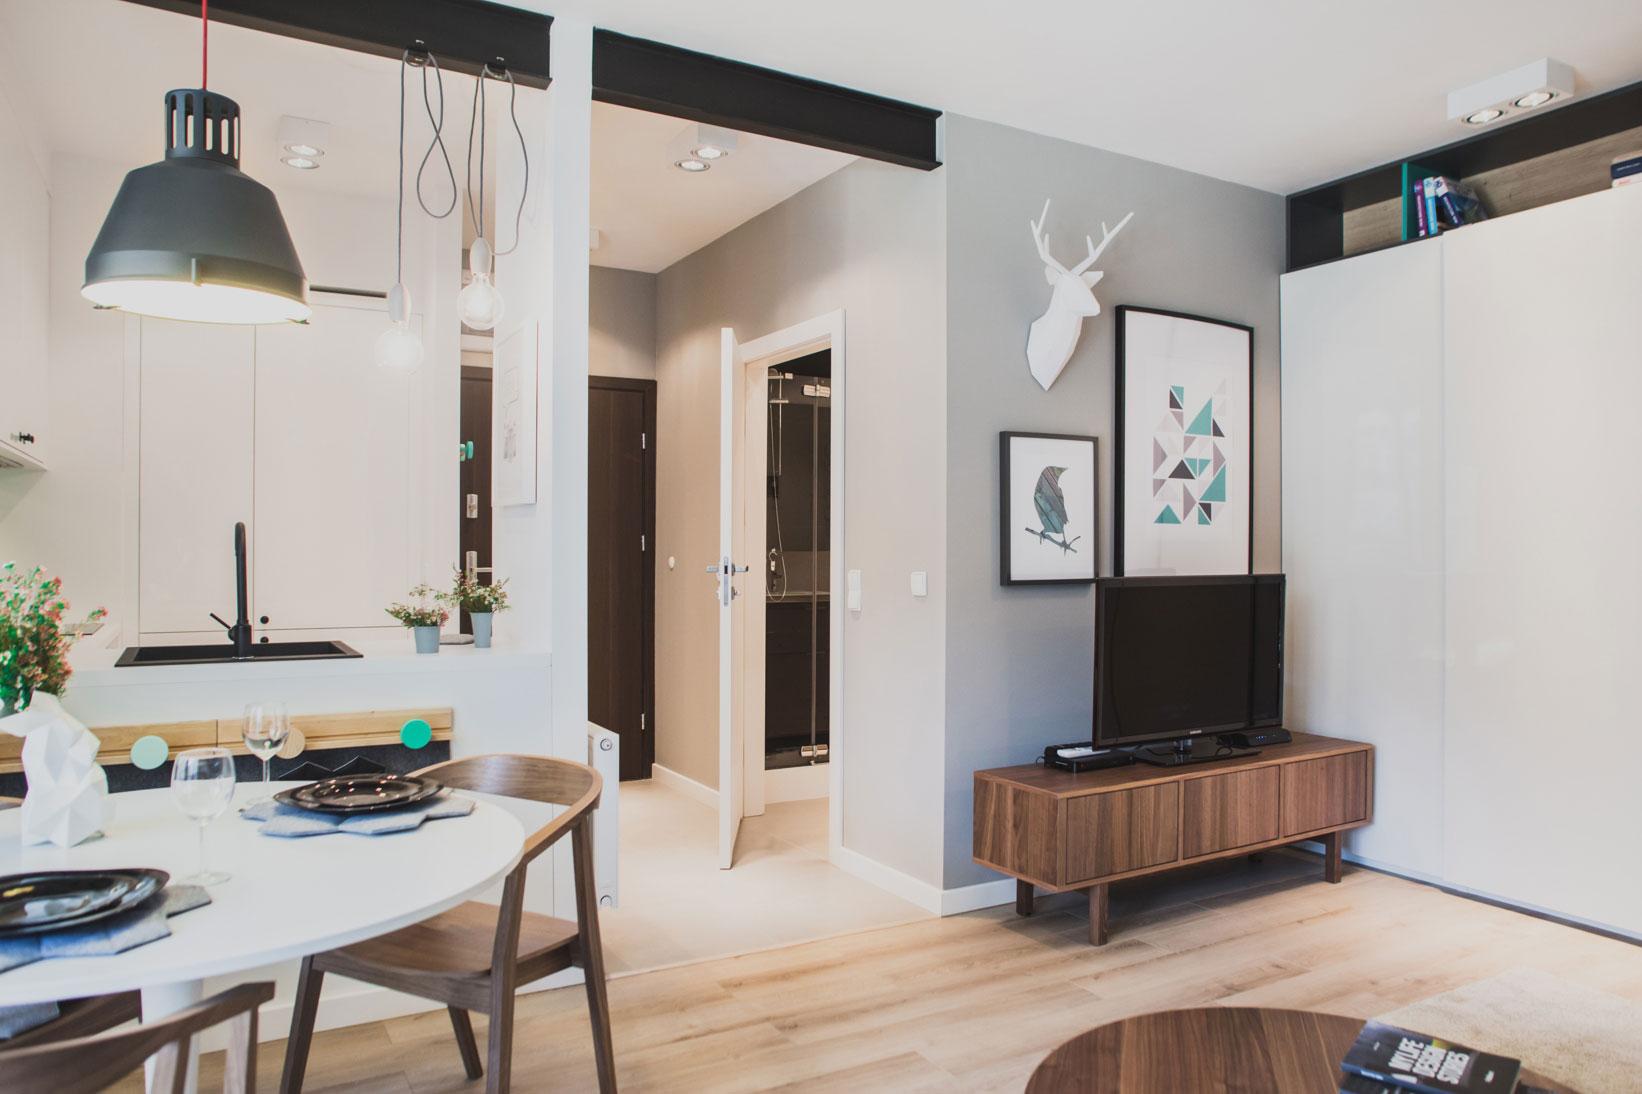 Szafarnia 2 Compact Apartment by Raca Architekci-04